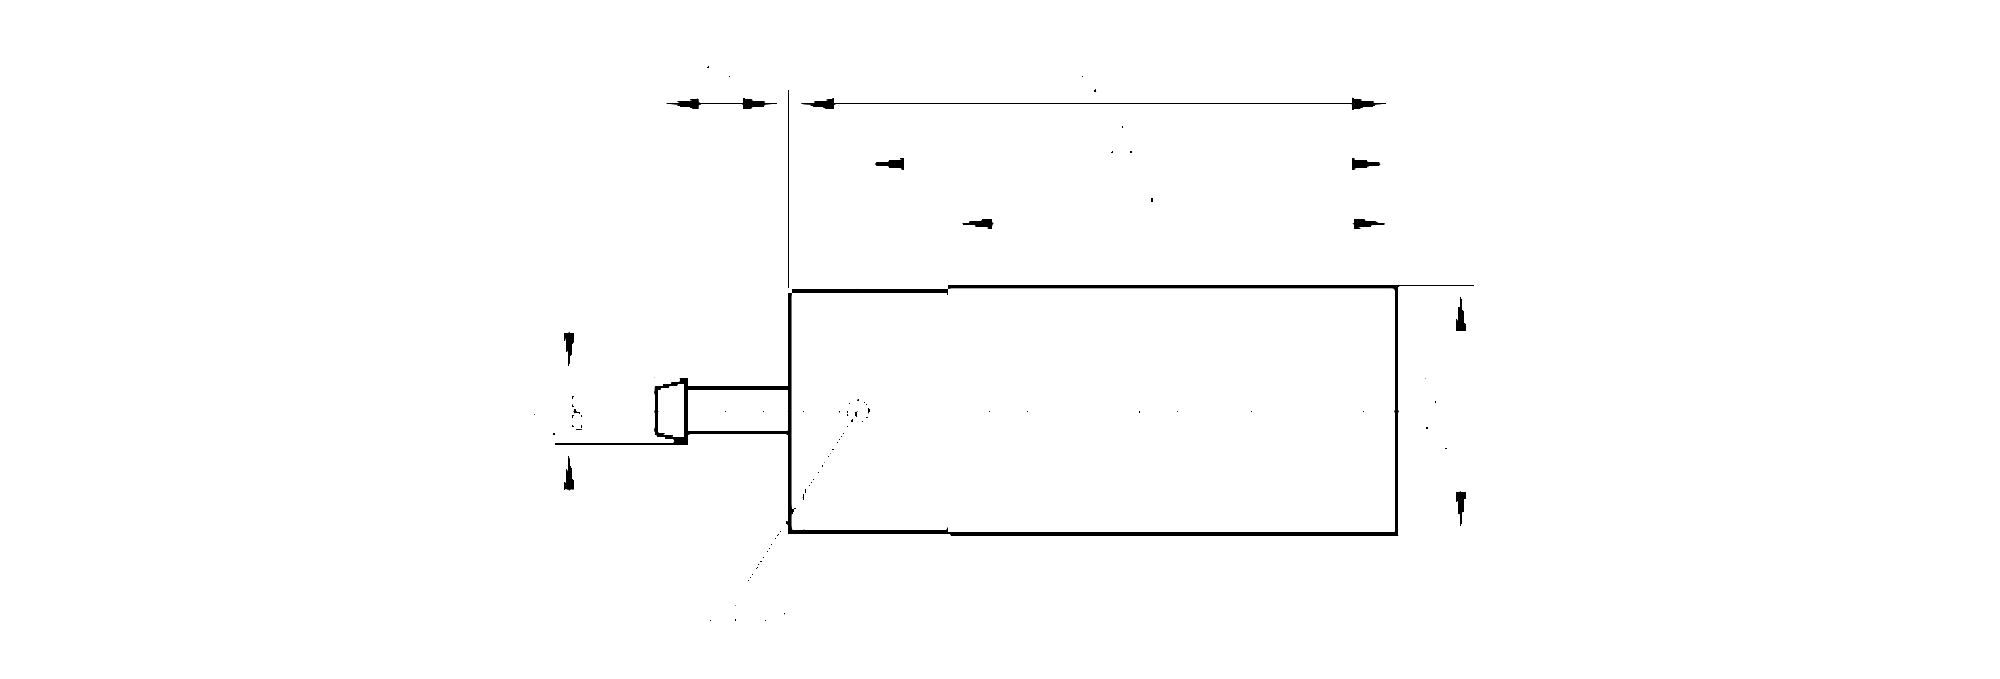 ib5096 - inductive sensor